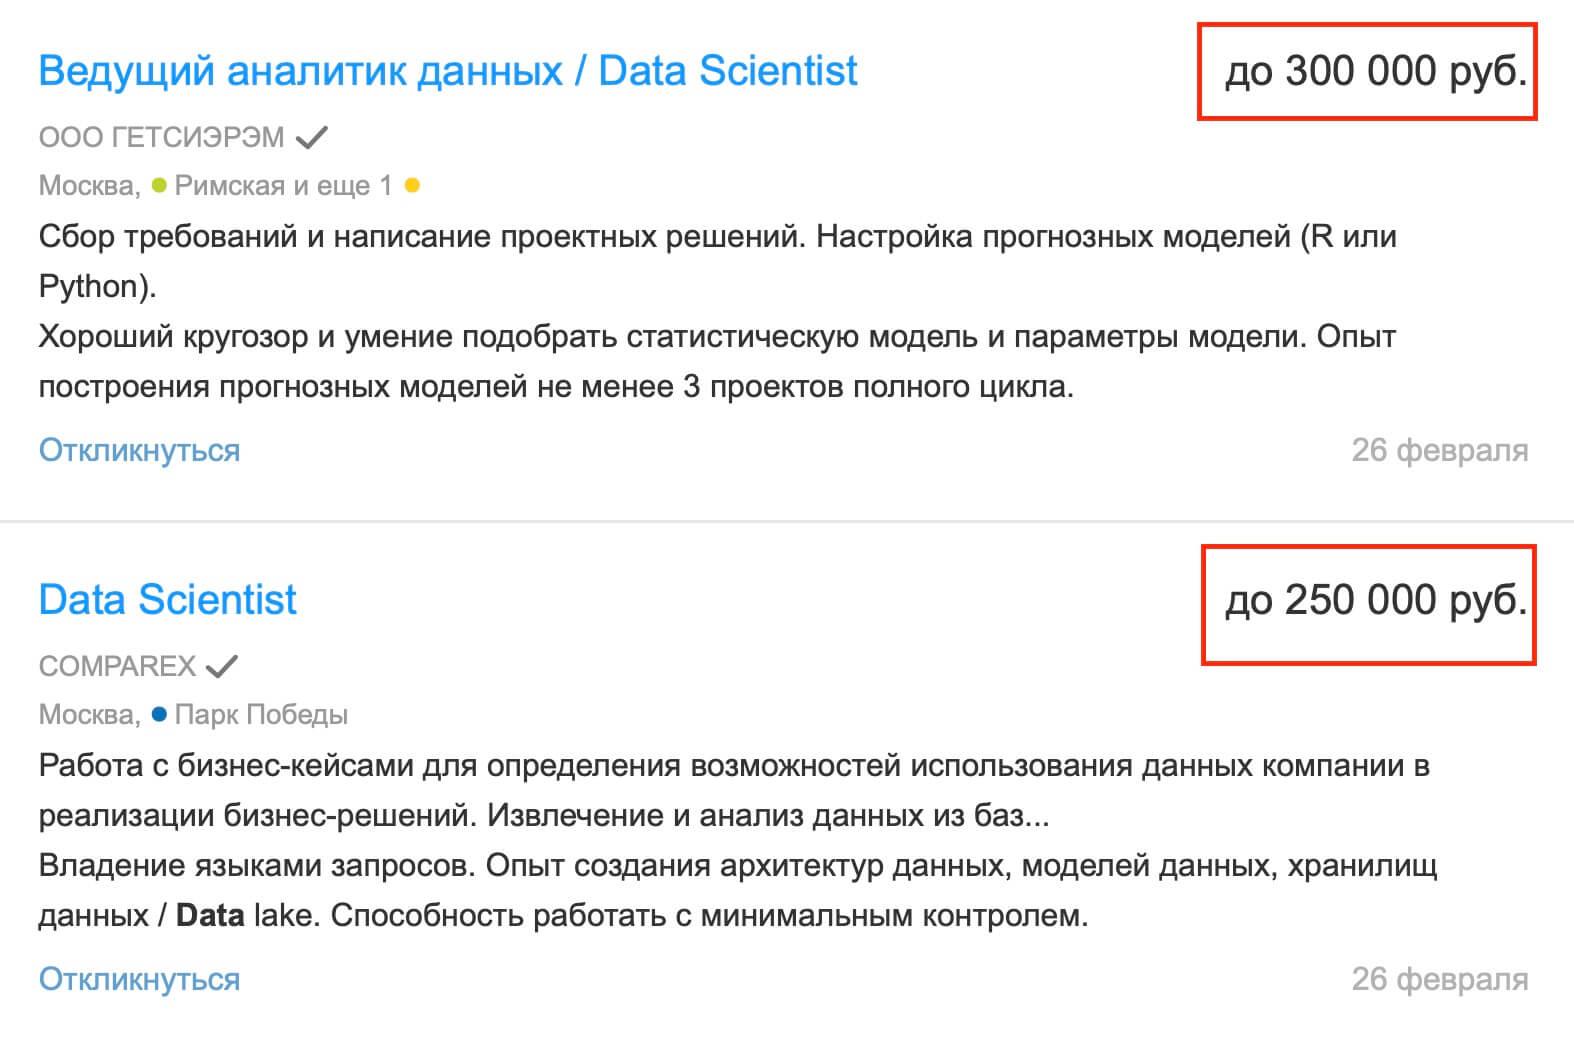 зарплата Data Scientist специалиста